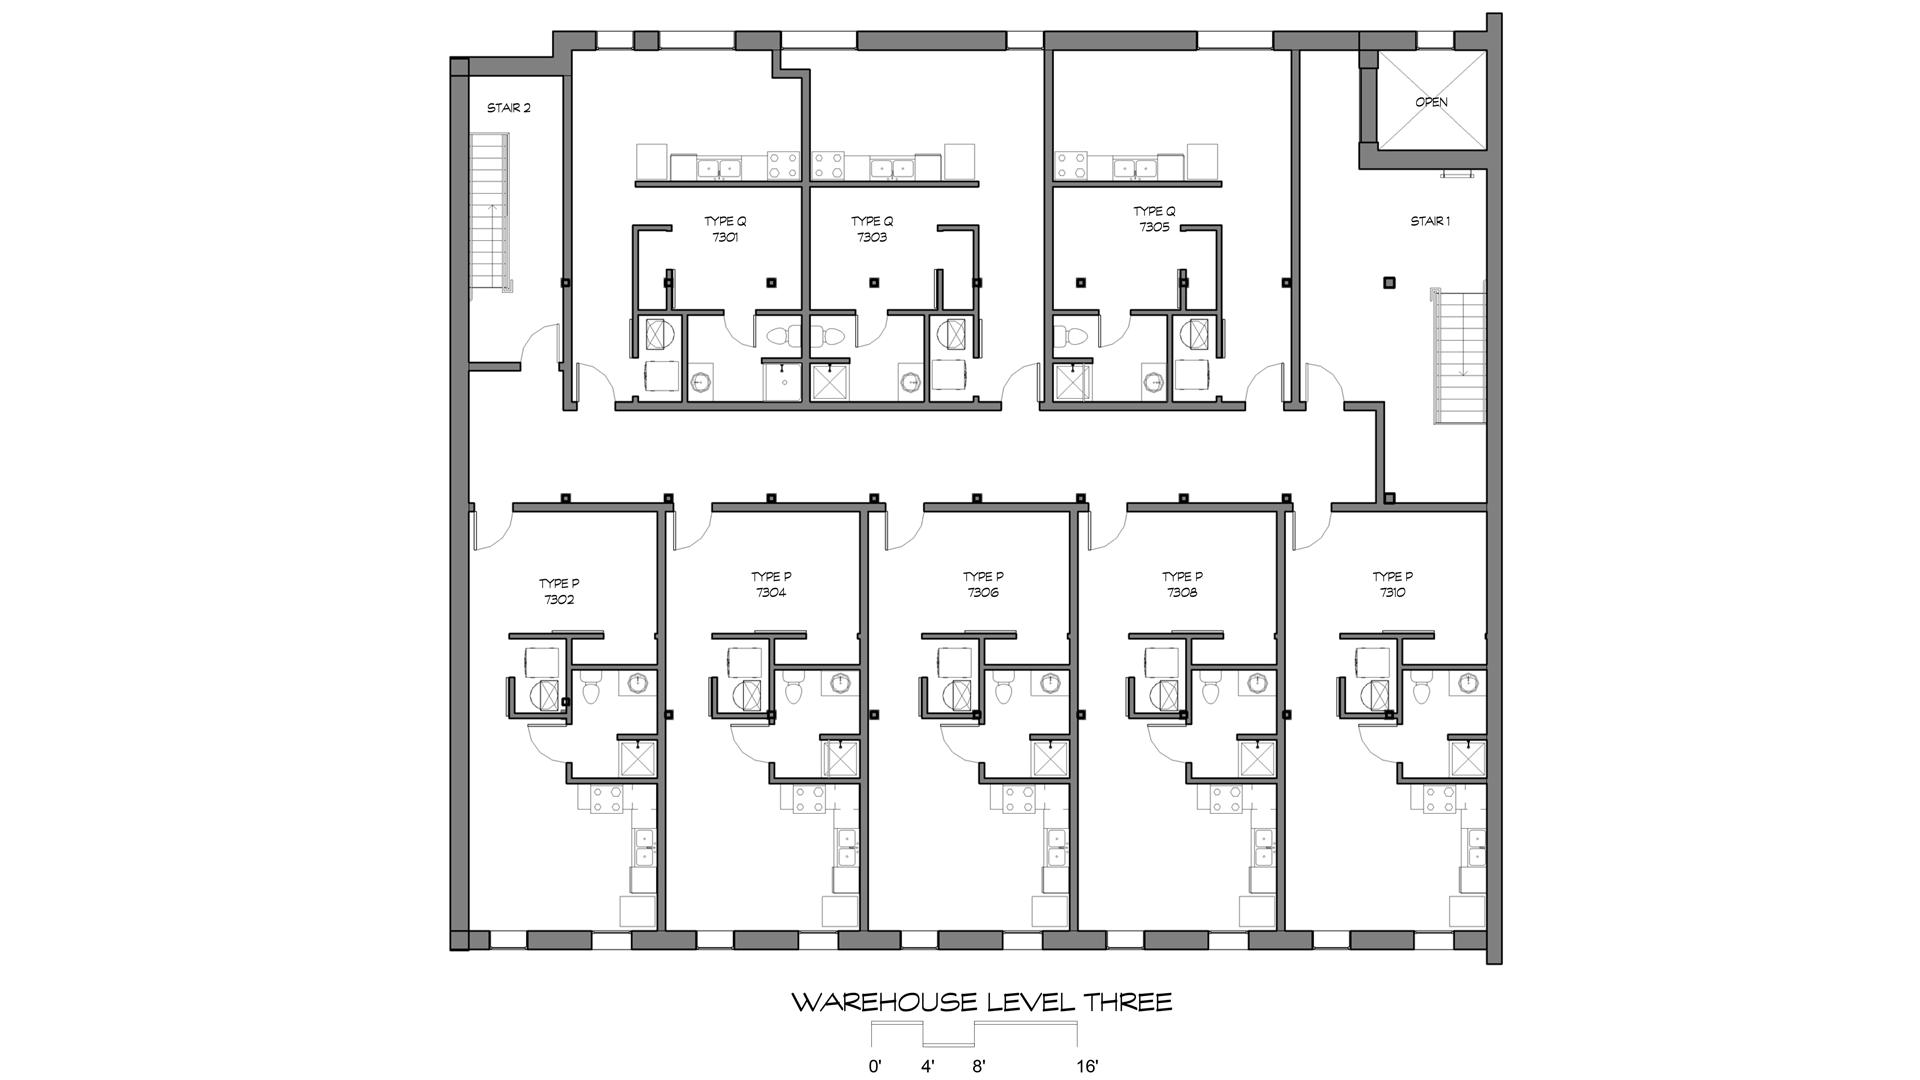 GML Warehouse Building Level Three